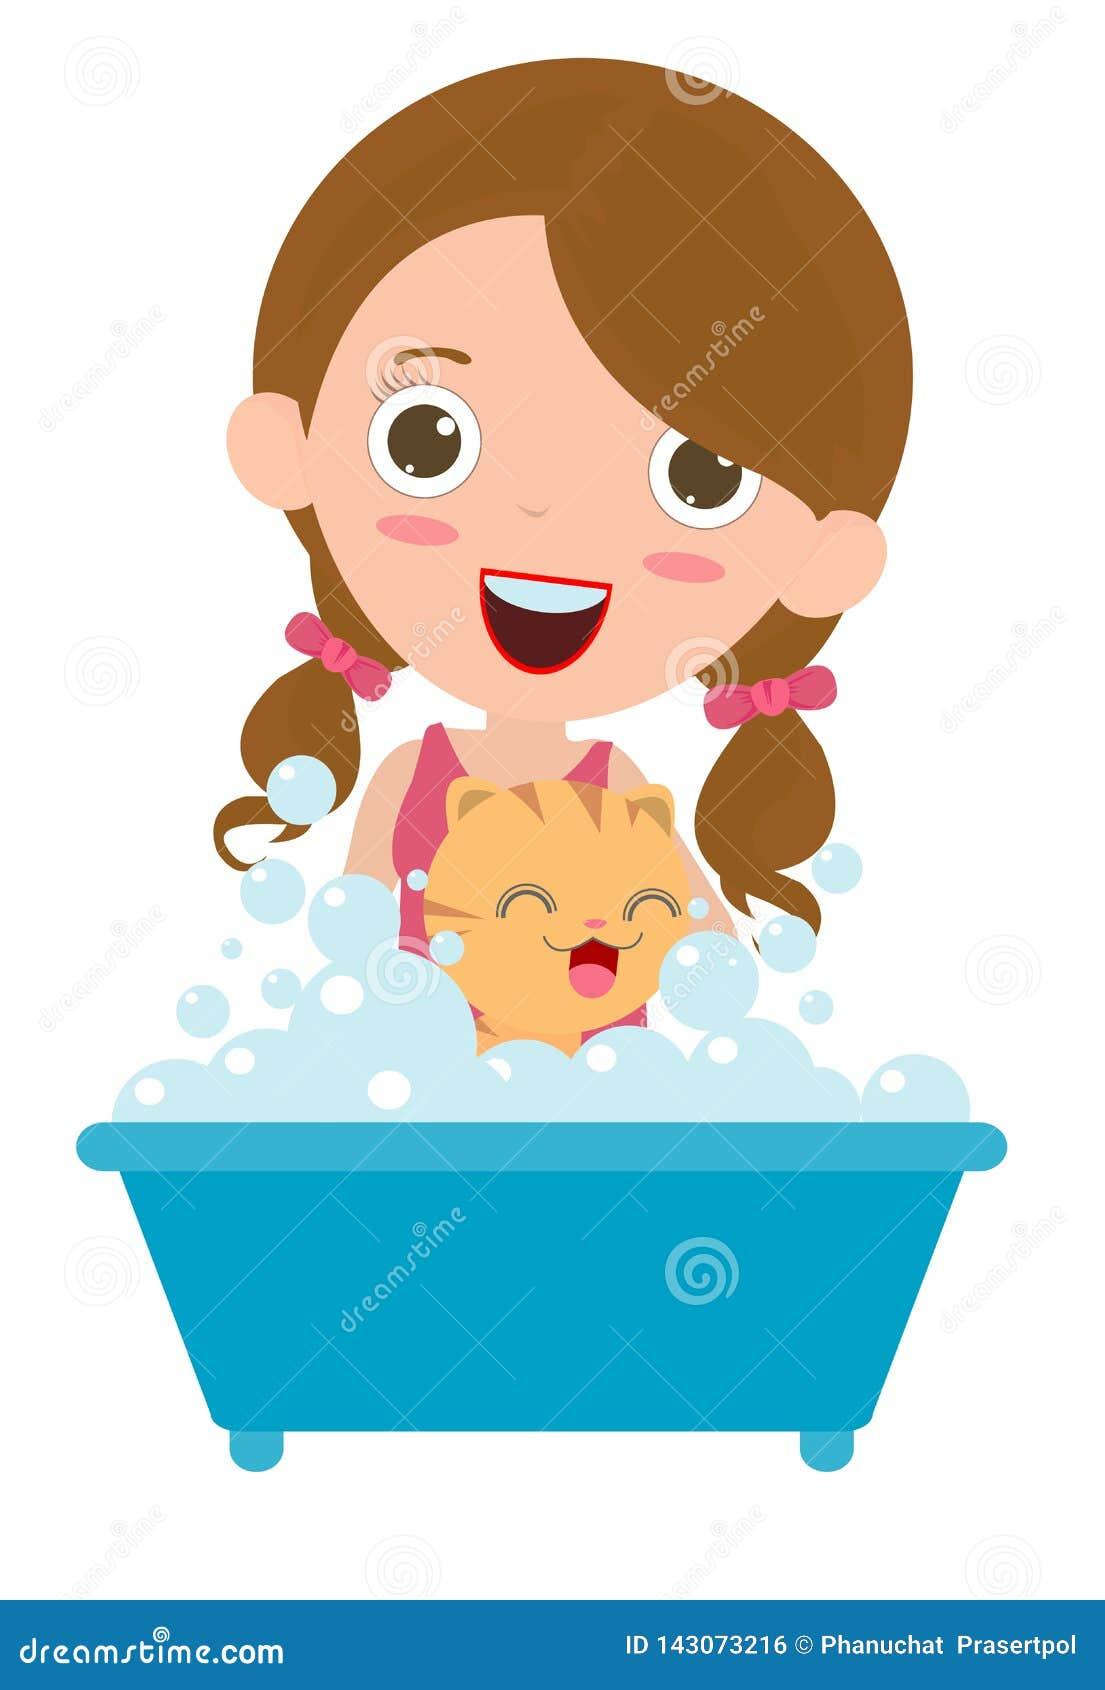 Women washing the cat, Happy Cat Having a Bath, Cat grooming, Vector flat cartoon illustration.